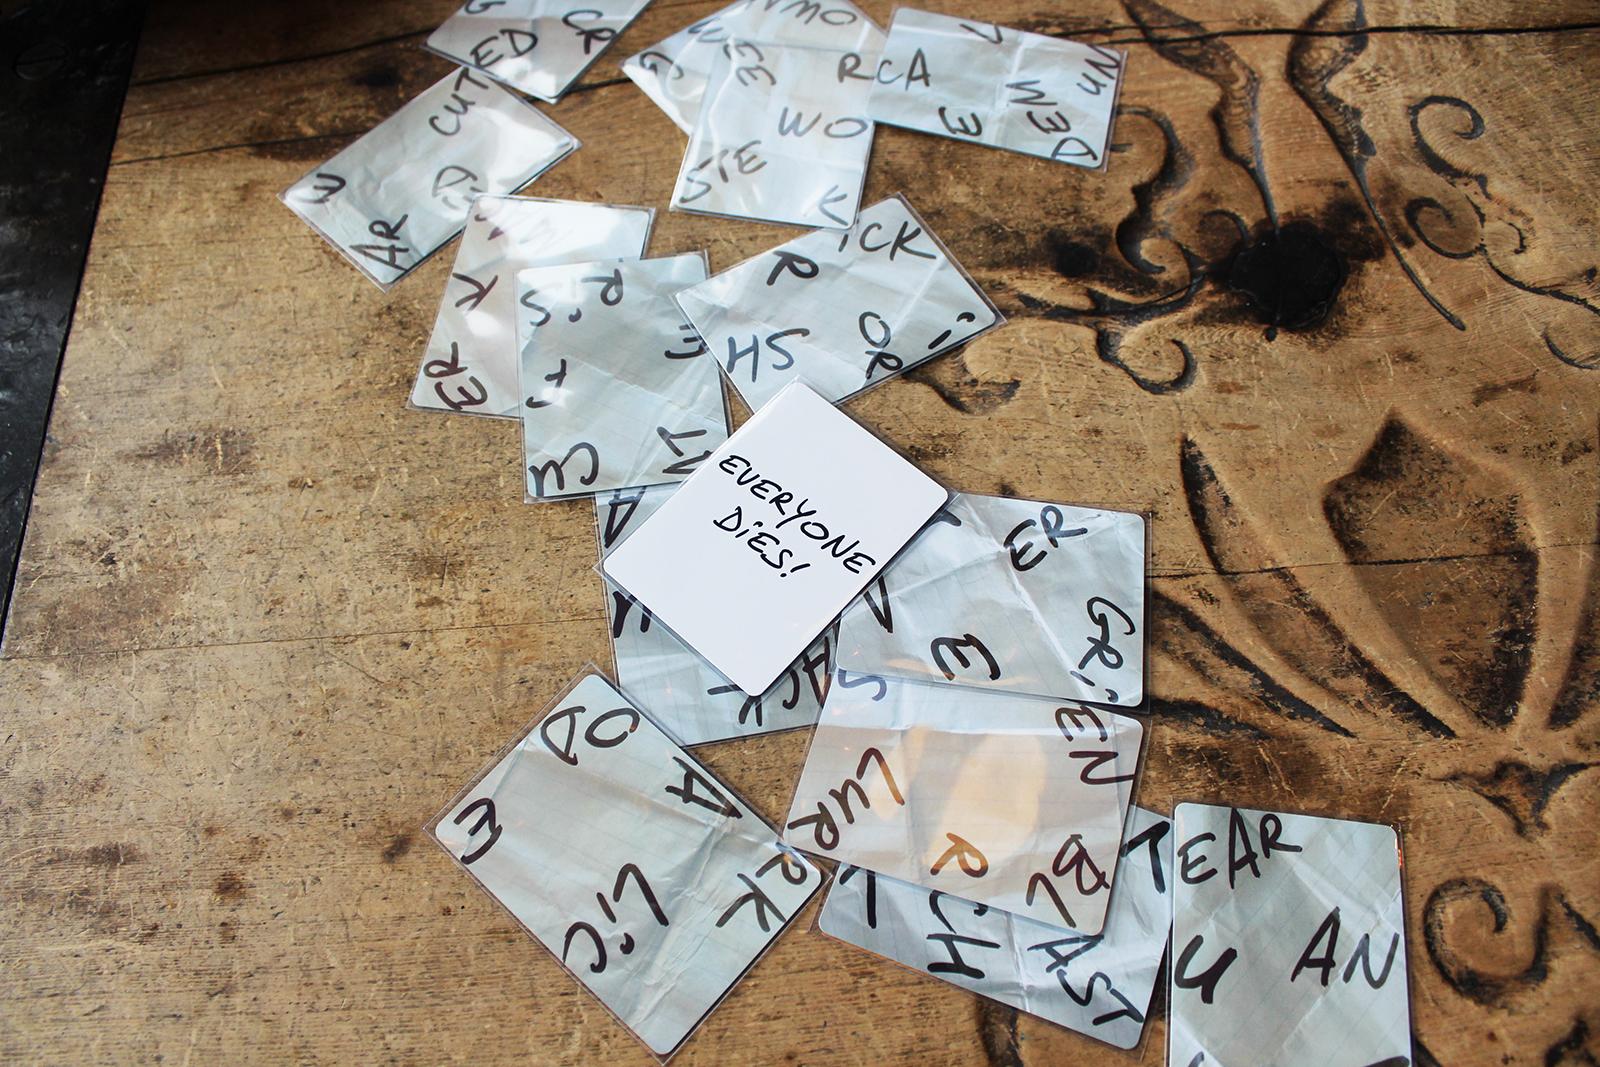 confabula-rasa-table-3-small.jpg